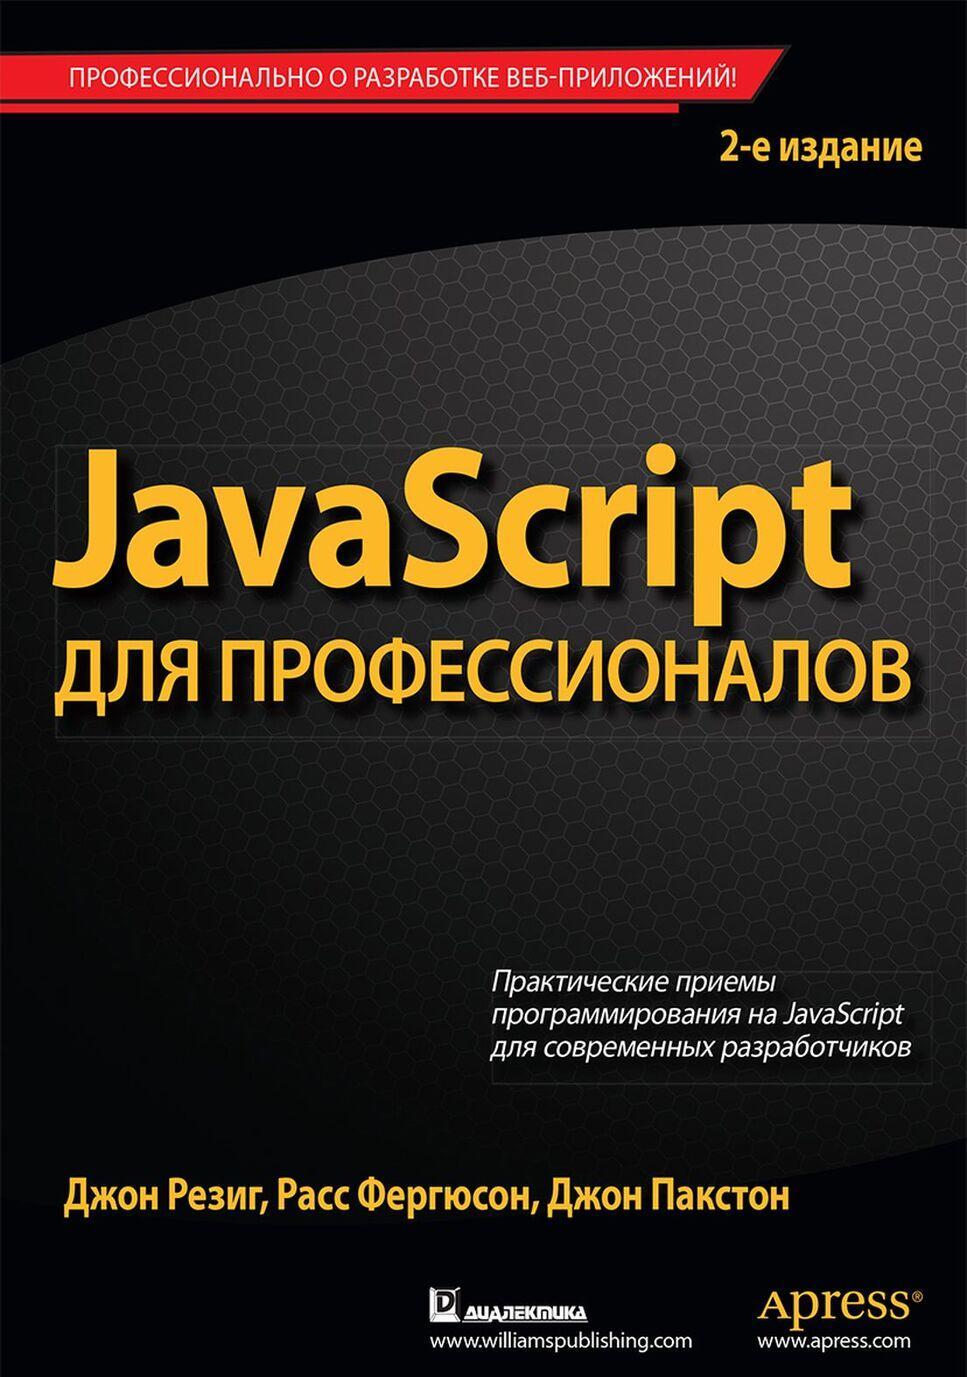 JavaScript dlja professionalov | Rezig Dzhon, Pakston Dzhon